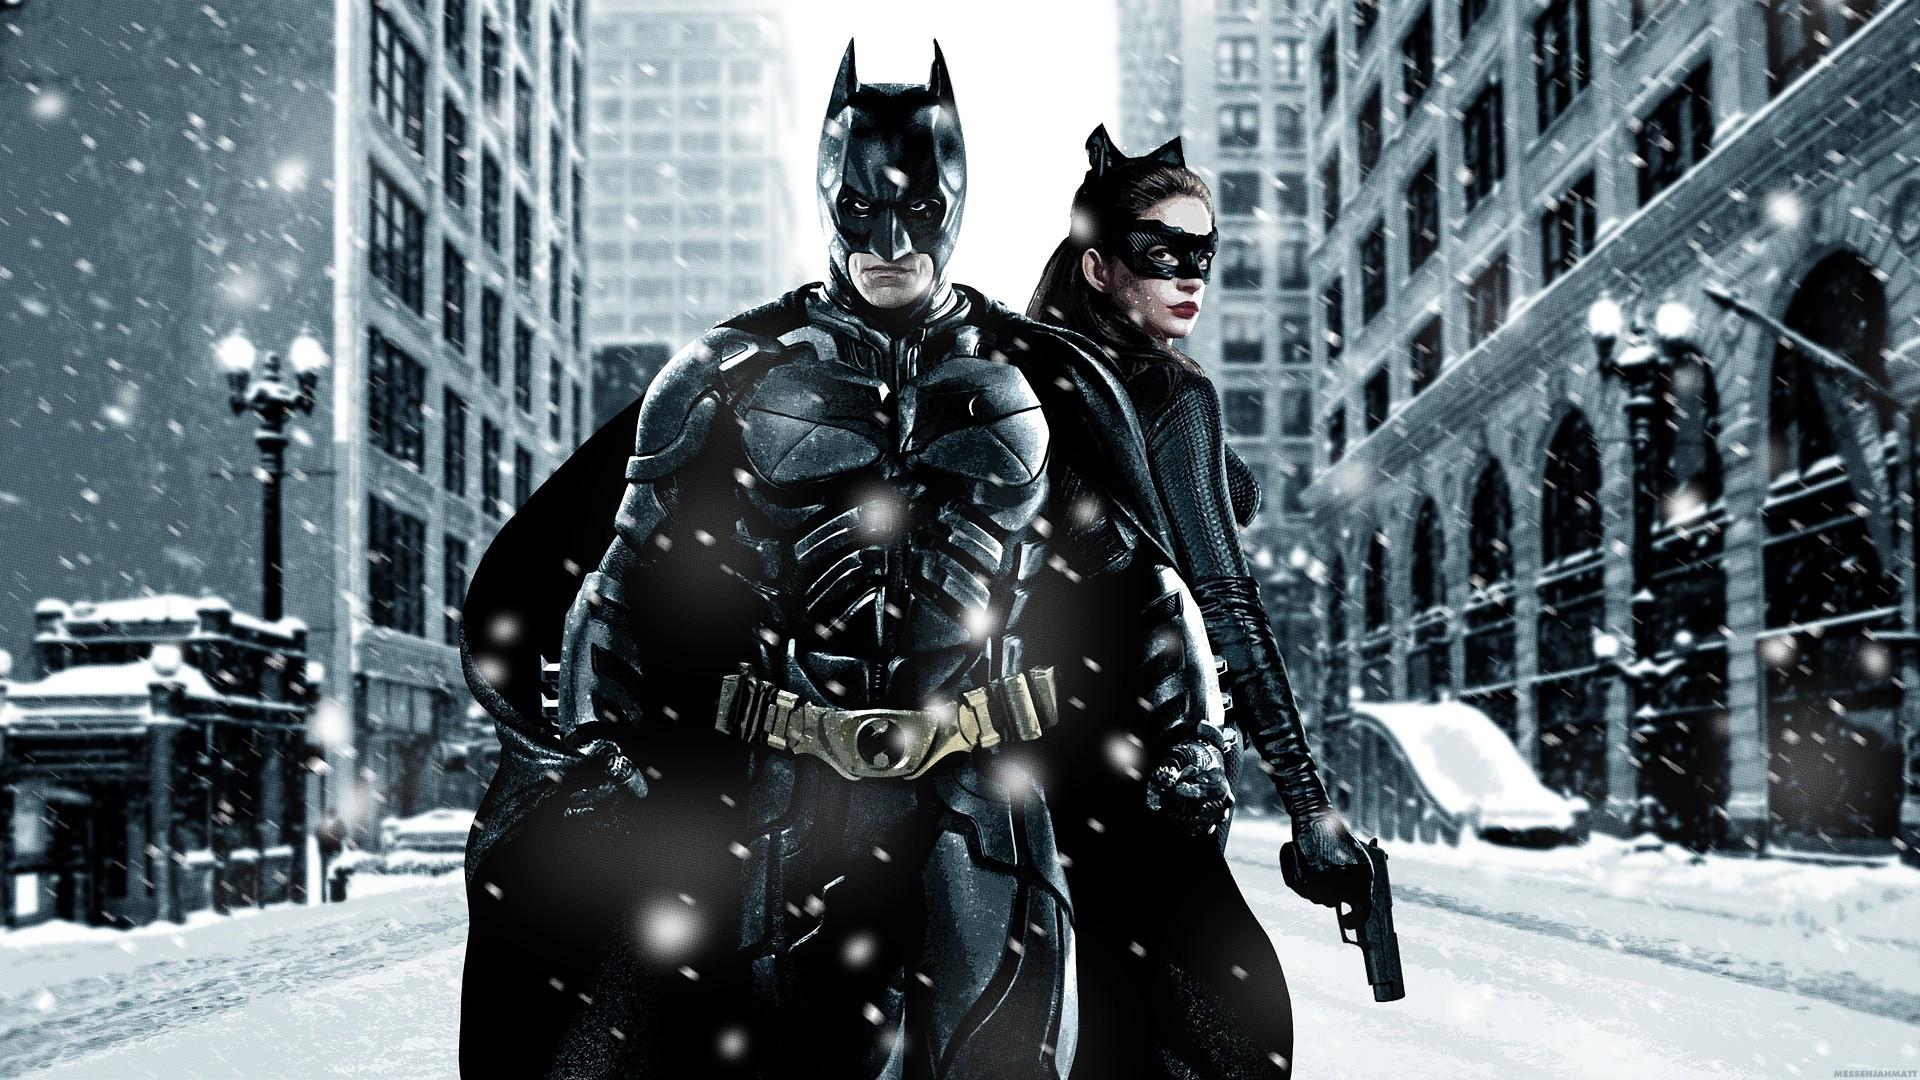 Batman snow Catwoman Gotham City Batman The Dark Knight Rises – Wallpaper (  / Wallbase.